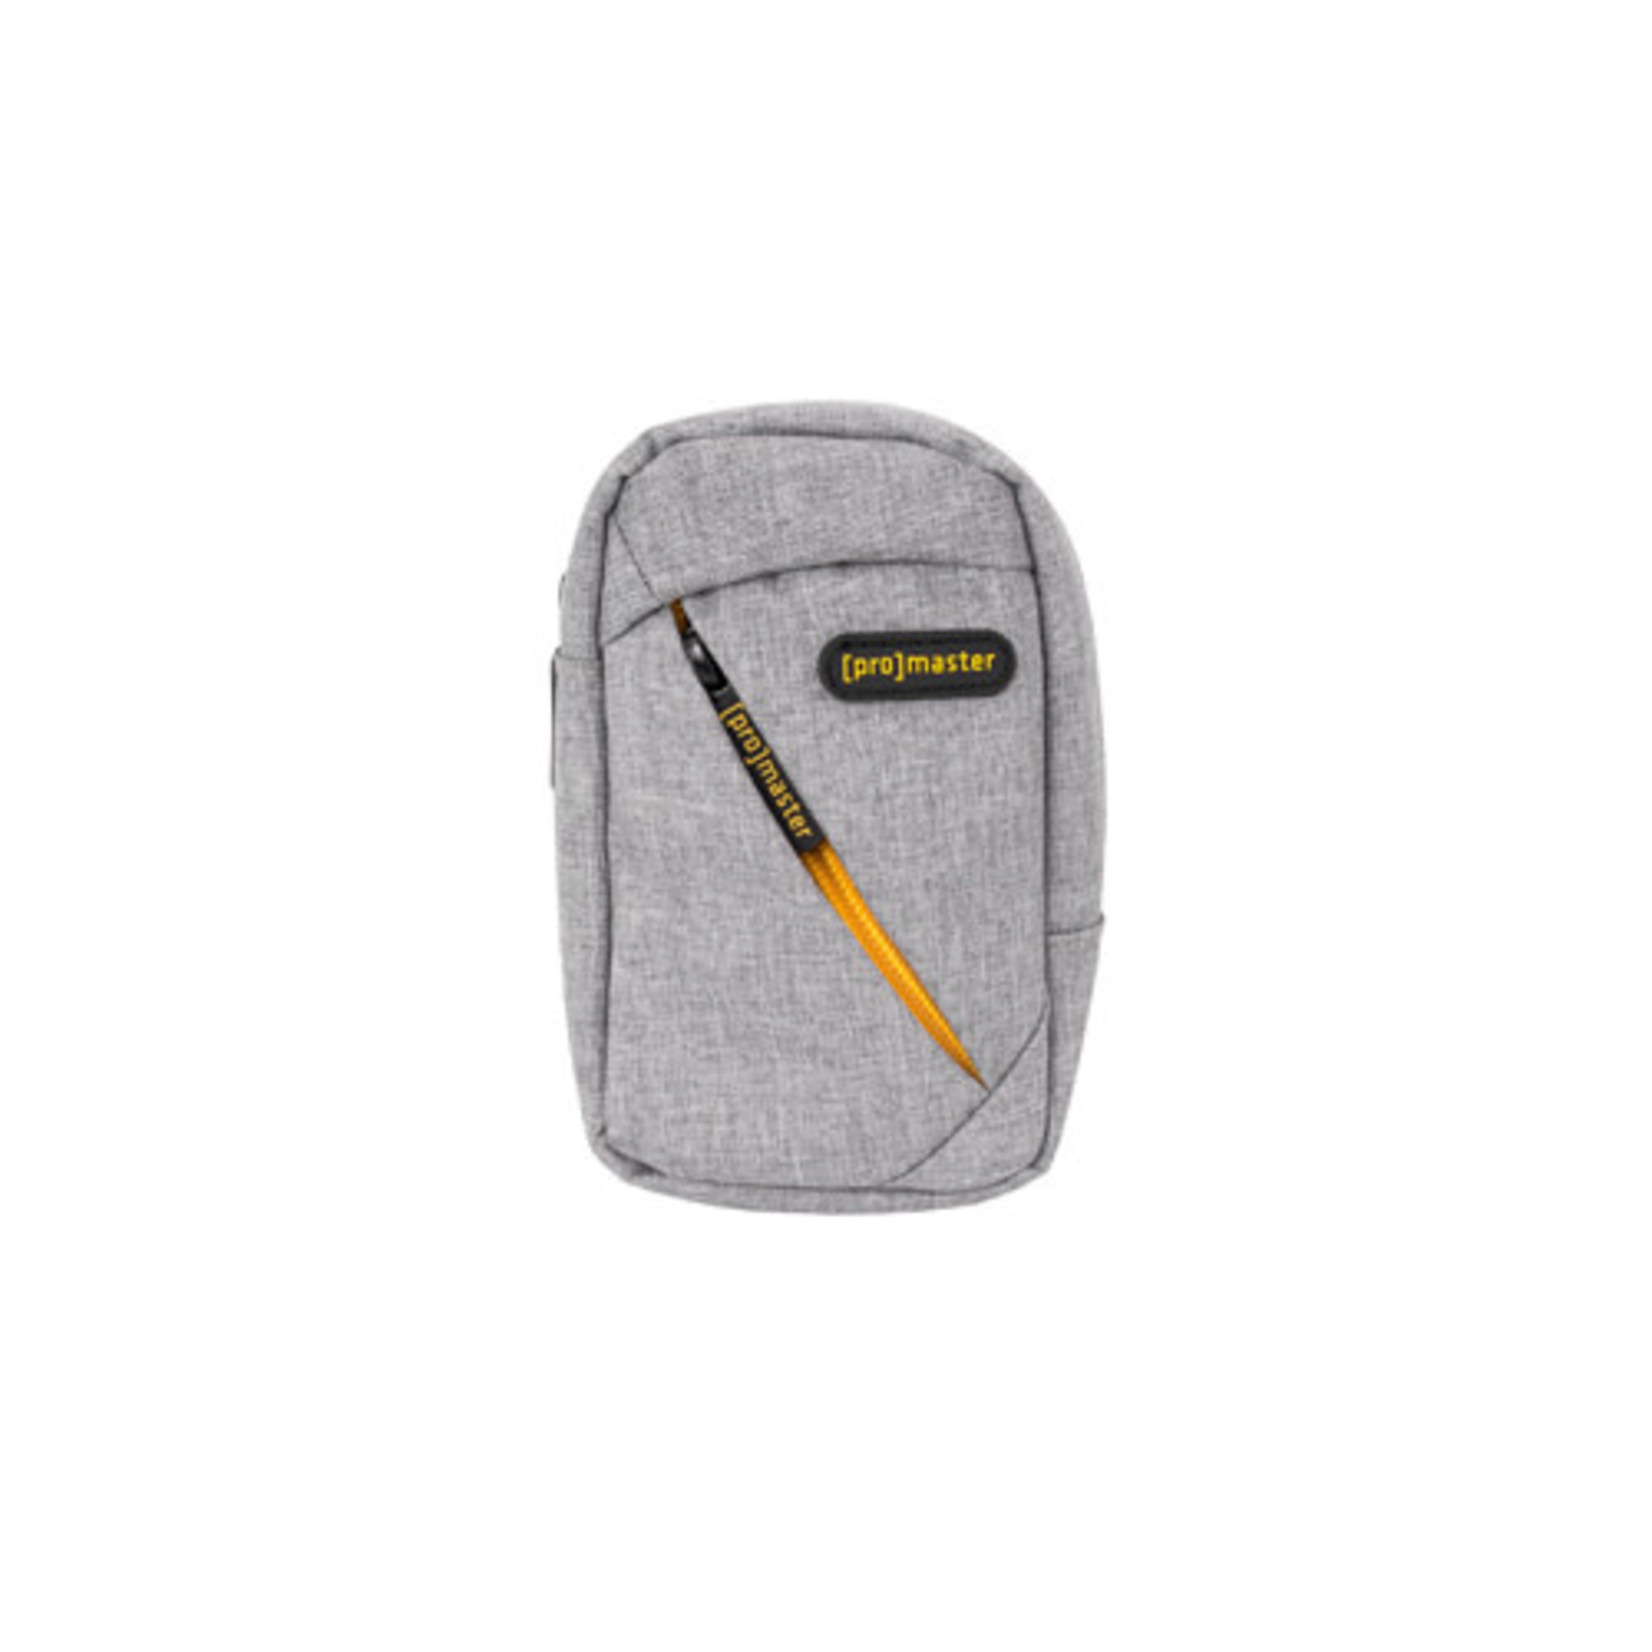 ProMaster Impulse Medium Pouch Case - Grey